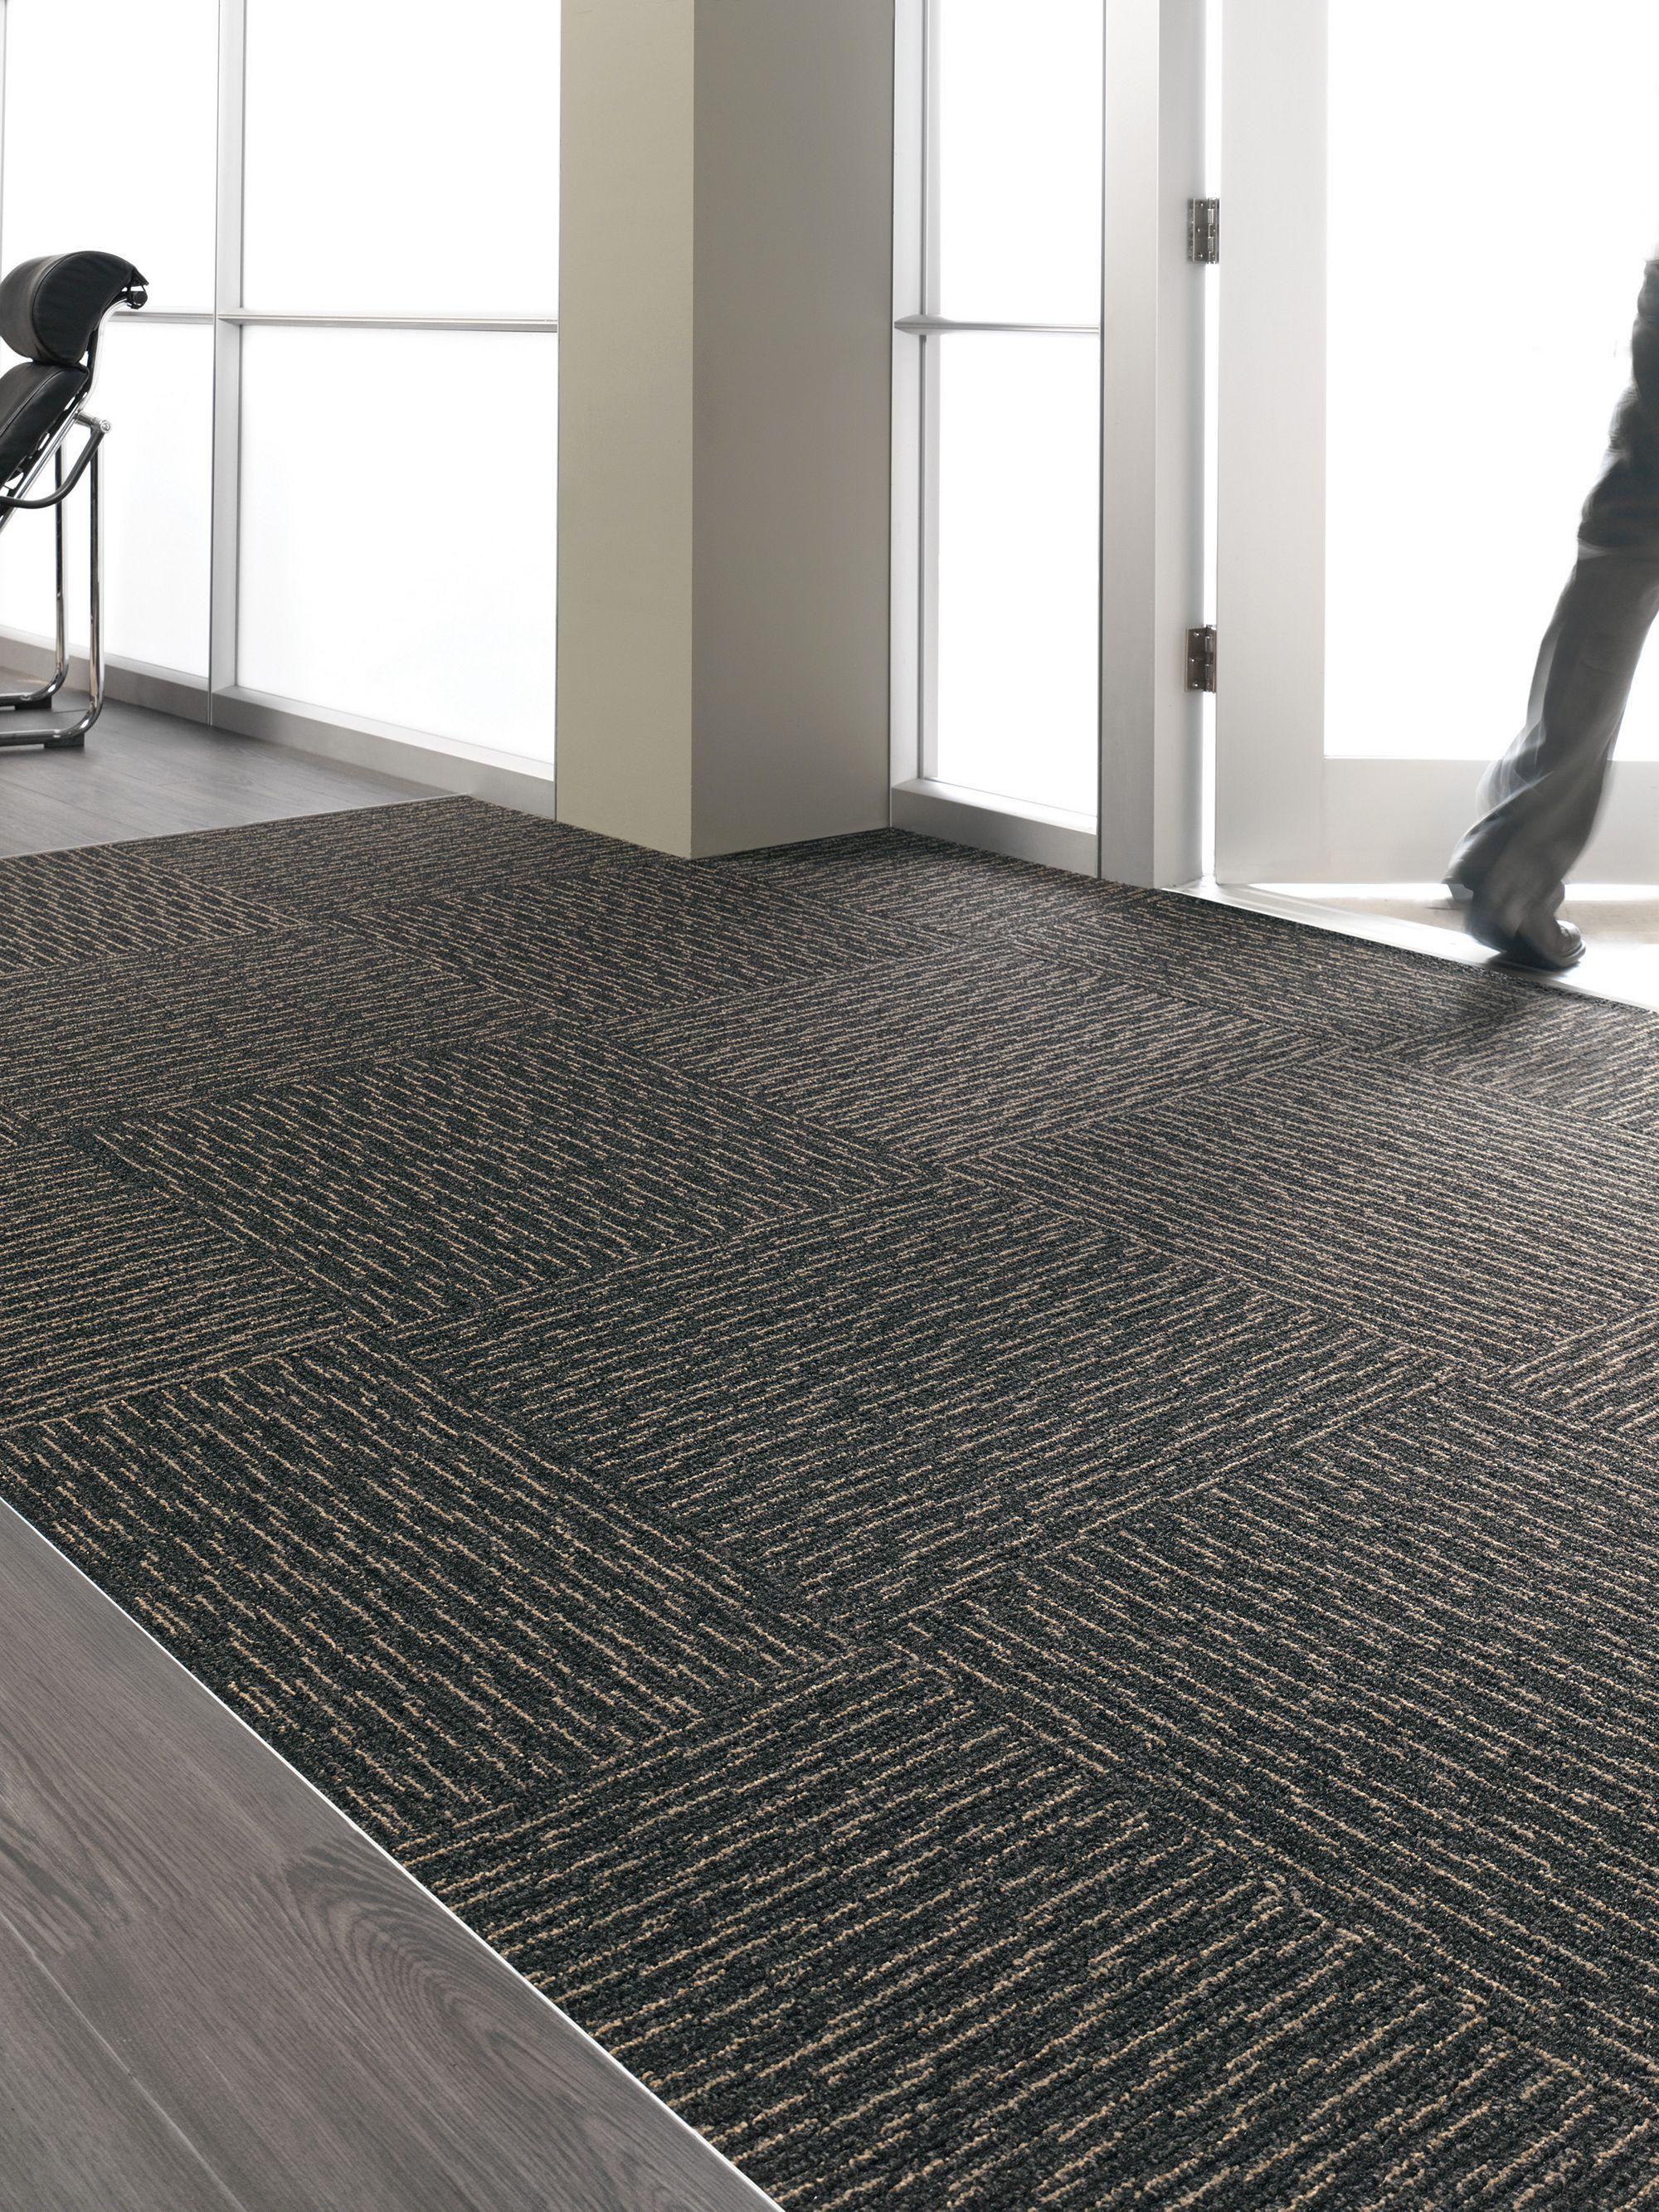 Carpet Tile Walk Off Step In Style Ii Tile Obsidian